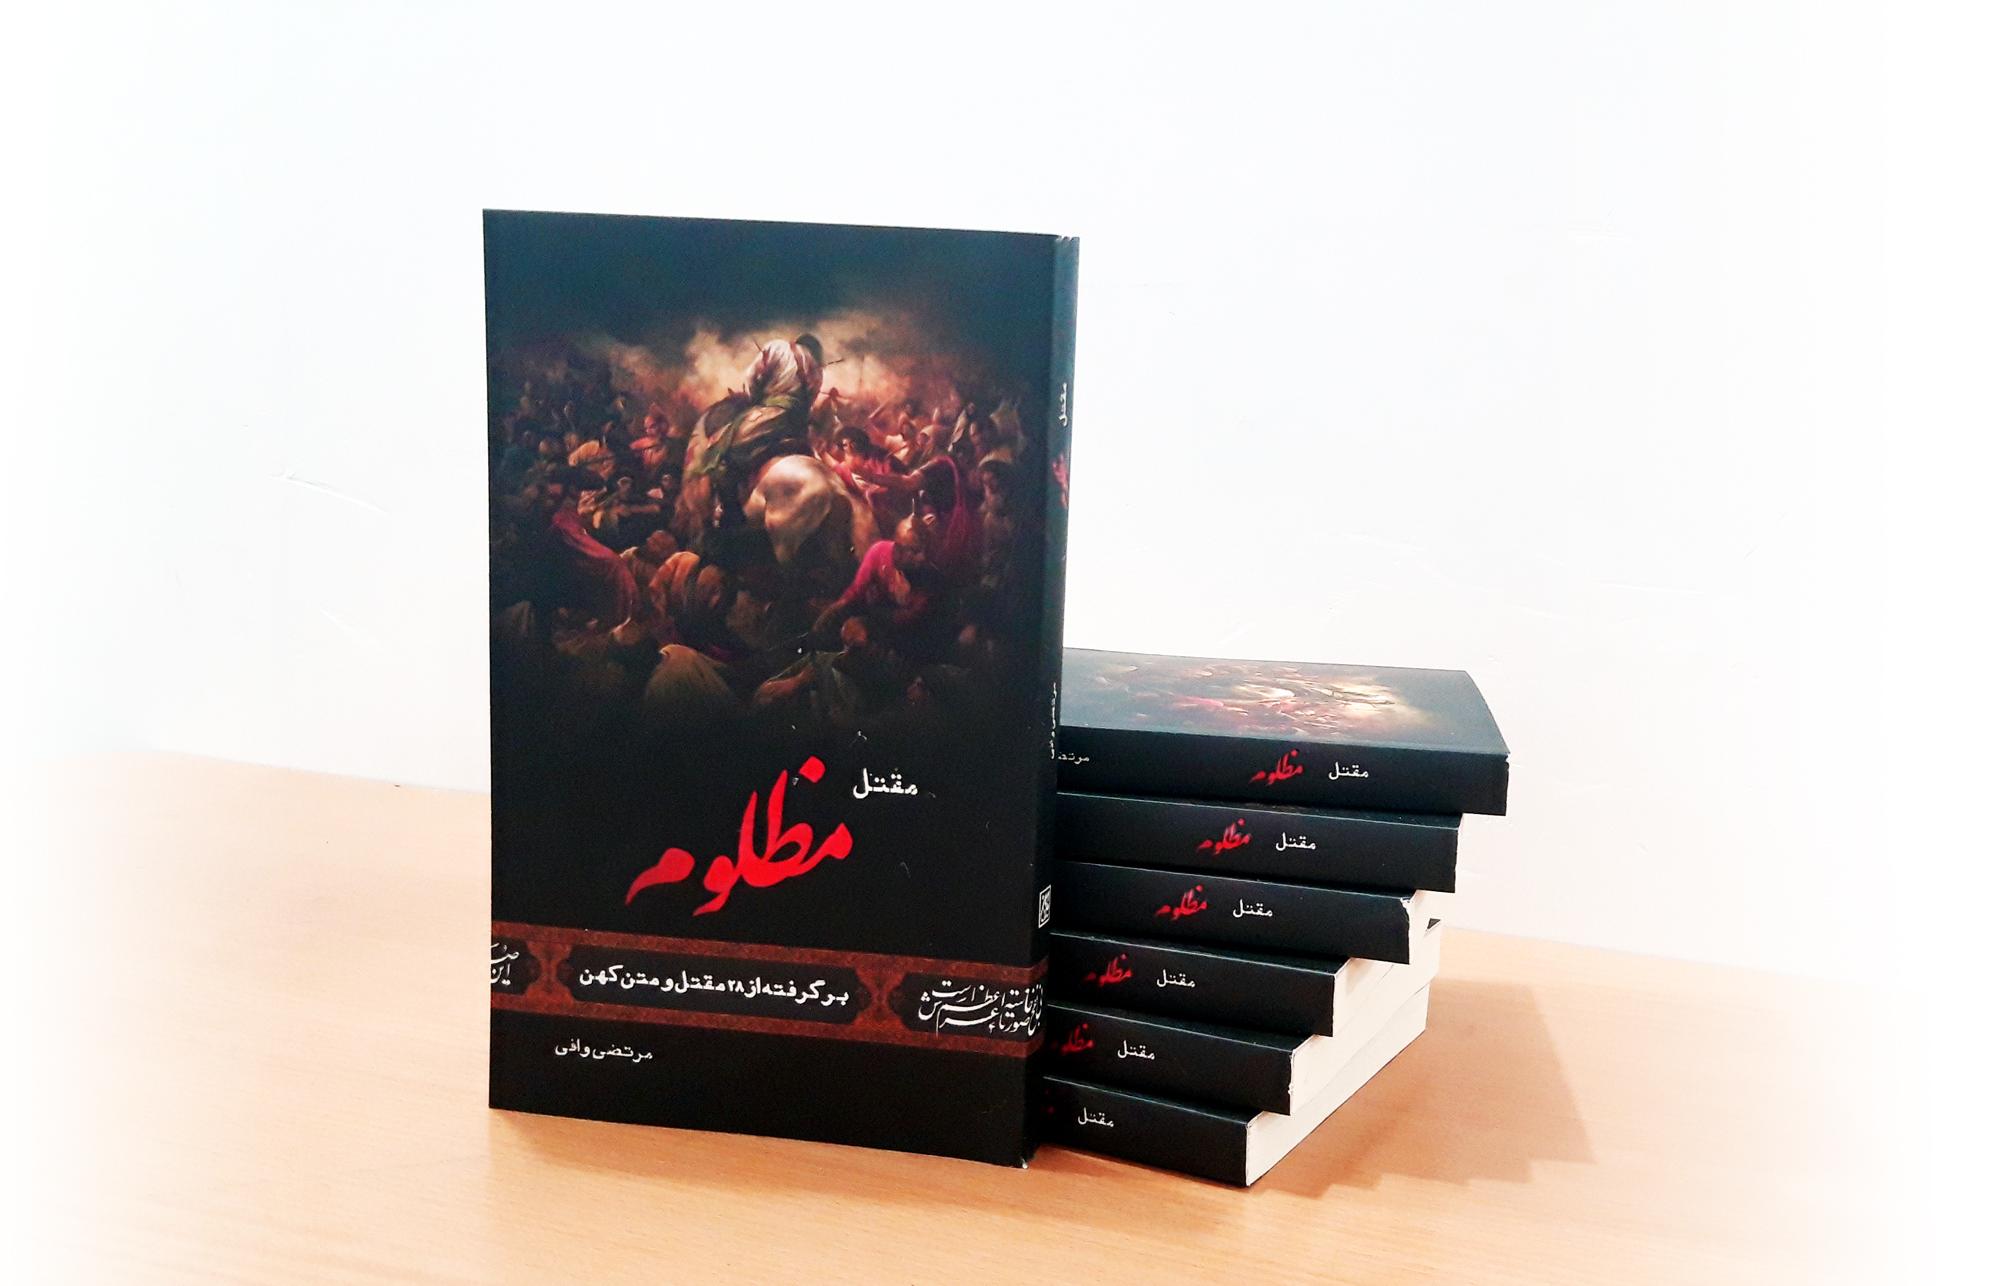 13990630000426 Test NewPhotoFree - «مقتل مظلوم» با طرح جلدی از «حسنروحالامین» در دست عزاداران حسینی